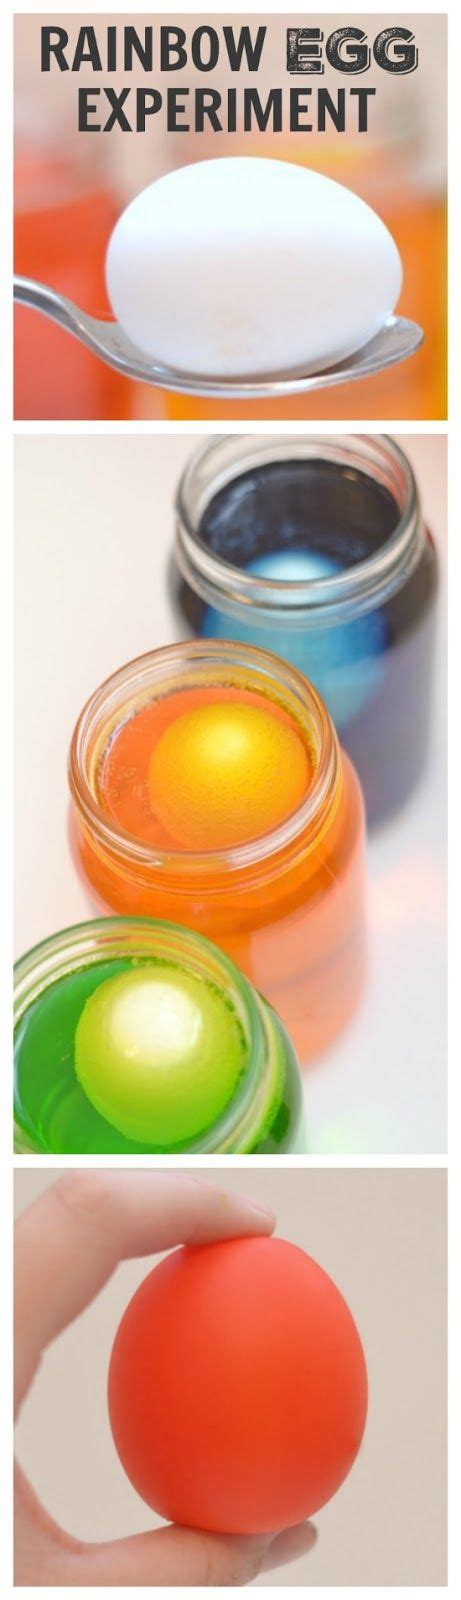 17 best ideas about egg experiments on kid 167 | 03f77334de0d368bac1b5af11bc282d6